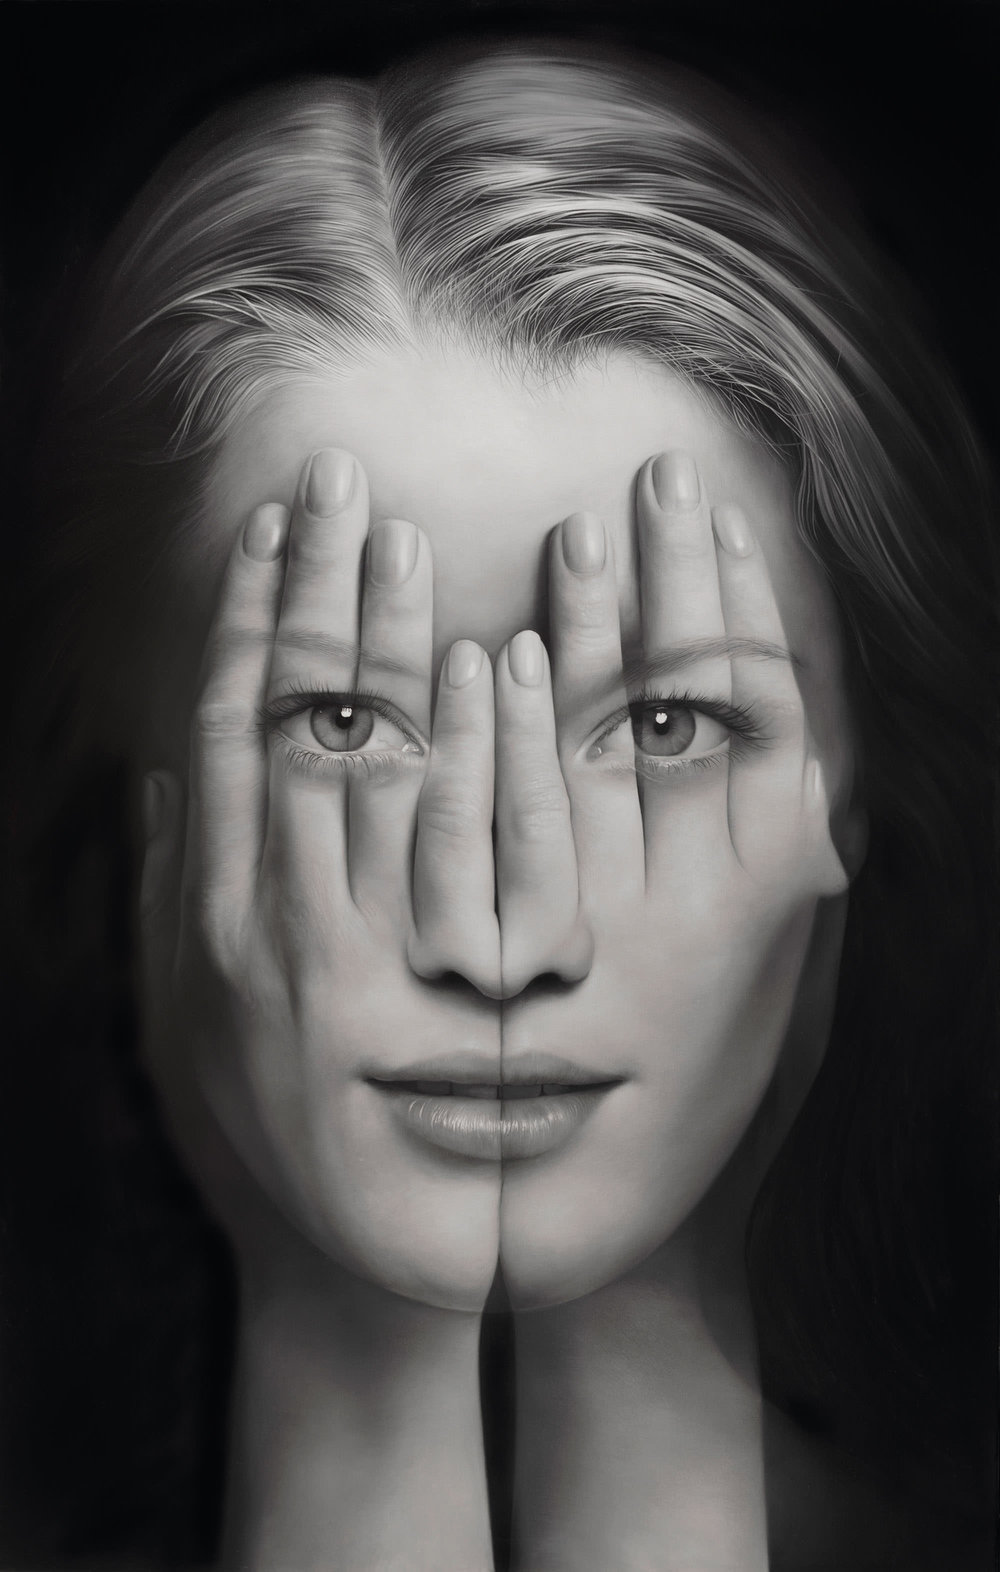 Tigran Tsitoghdzya, Mirror V, 2014, Olio su tela 190x127 cm. photo by  Tigran Tsitoghdzya